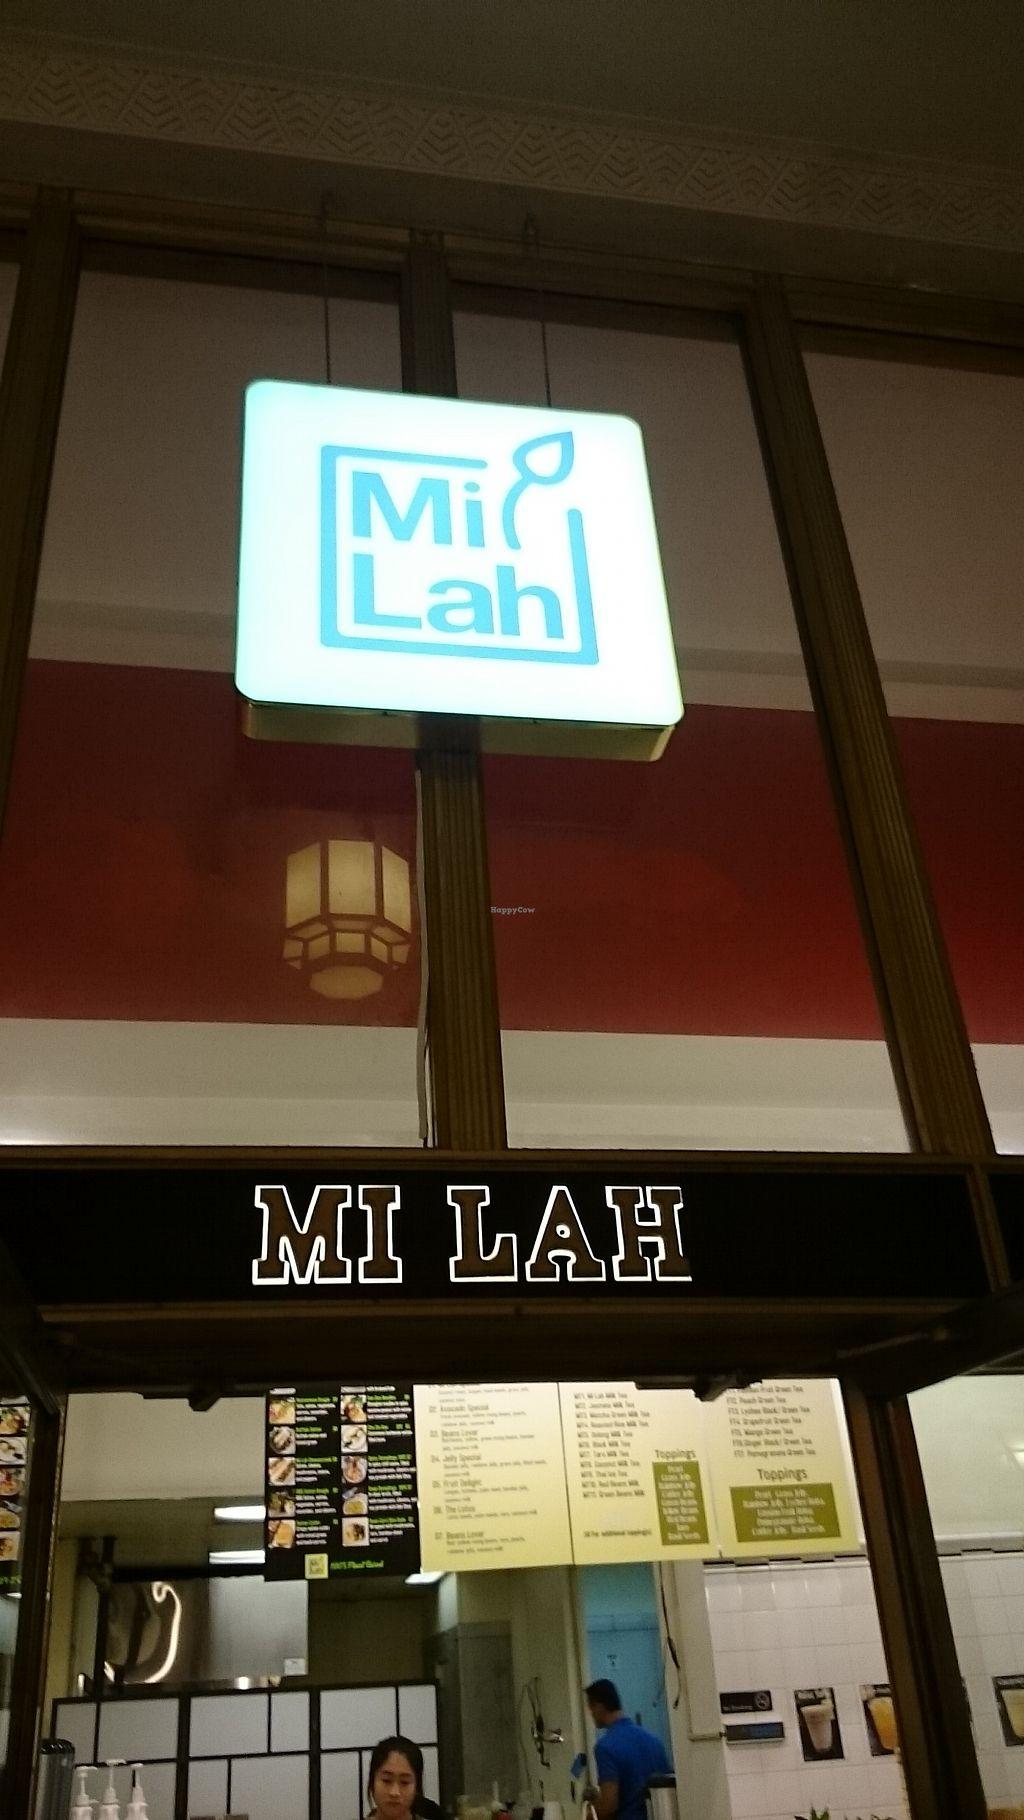 "Photo of Mi Lah - University City  by <a href=""/members/profile/ZoraySpielvogel"">ZoraySpielvogel</a> <br/>Front entrance.  <br/> September 10, 2017  - <a href='/contact/abuse/image/99300/302967'>Report</a>"